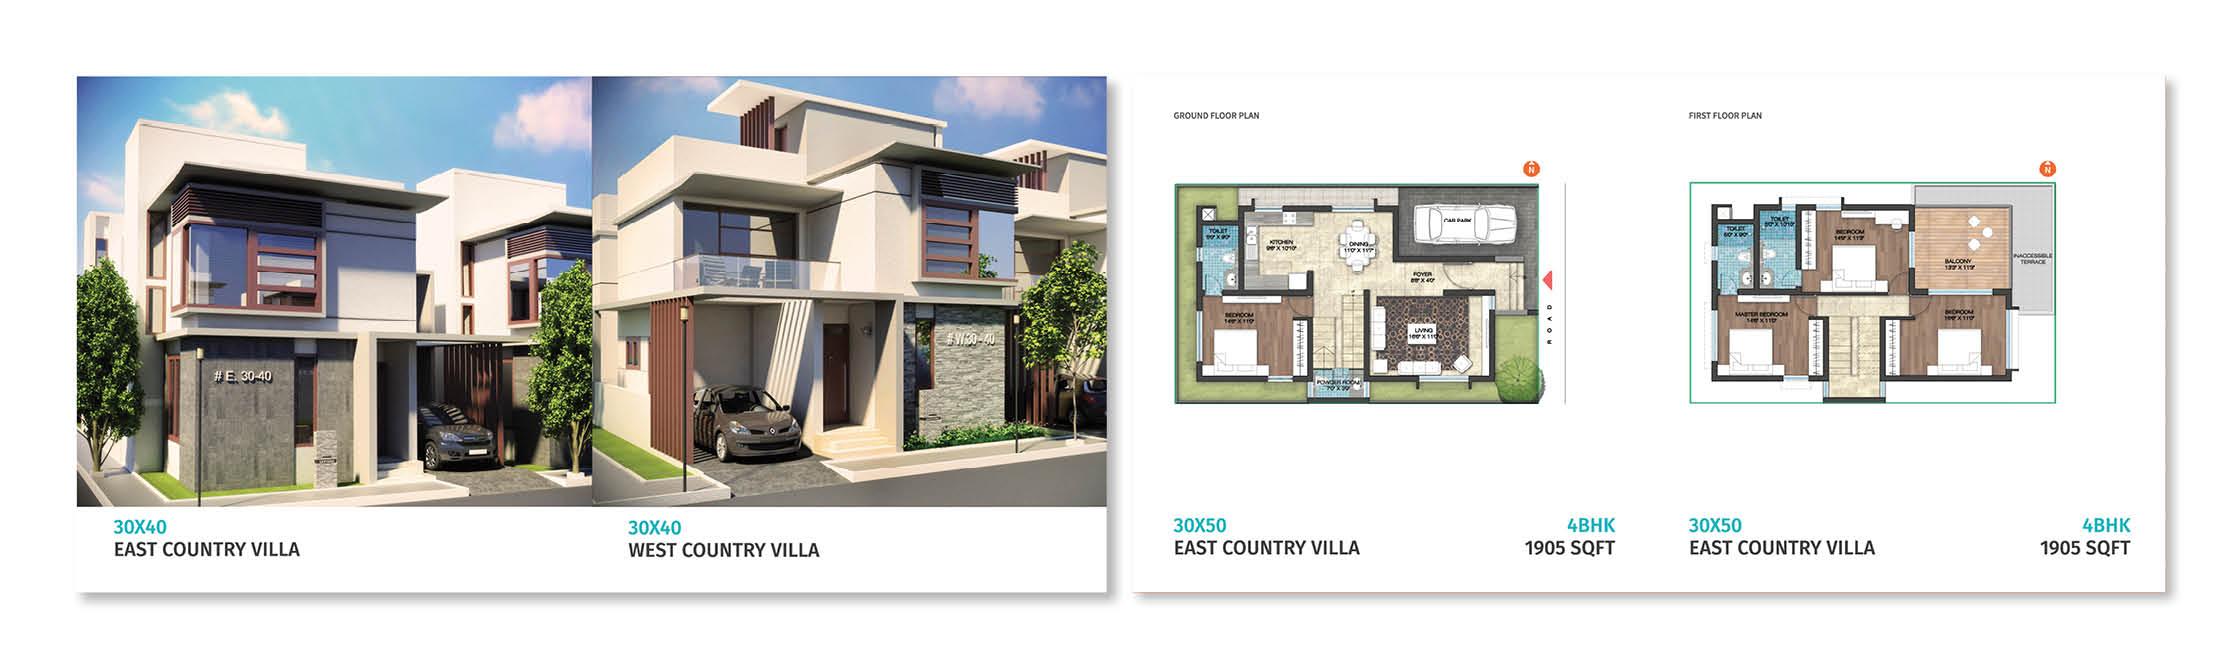 Rezonant design Real Estate CommonWealth Print Design Design 08